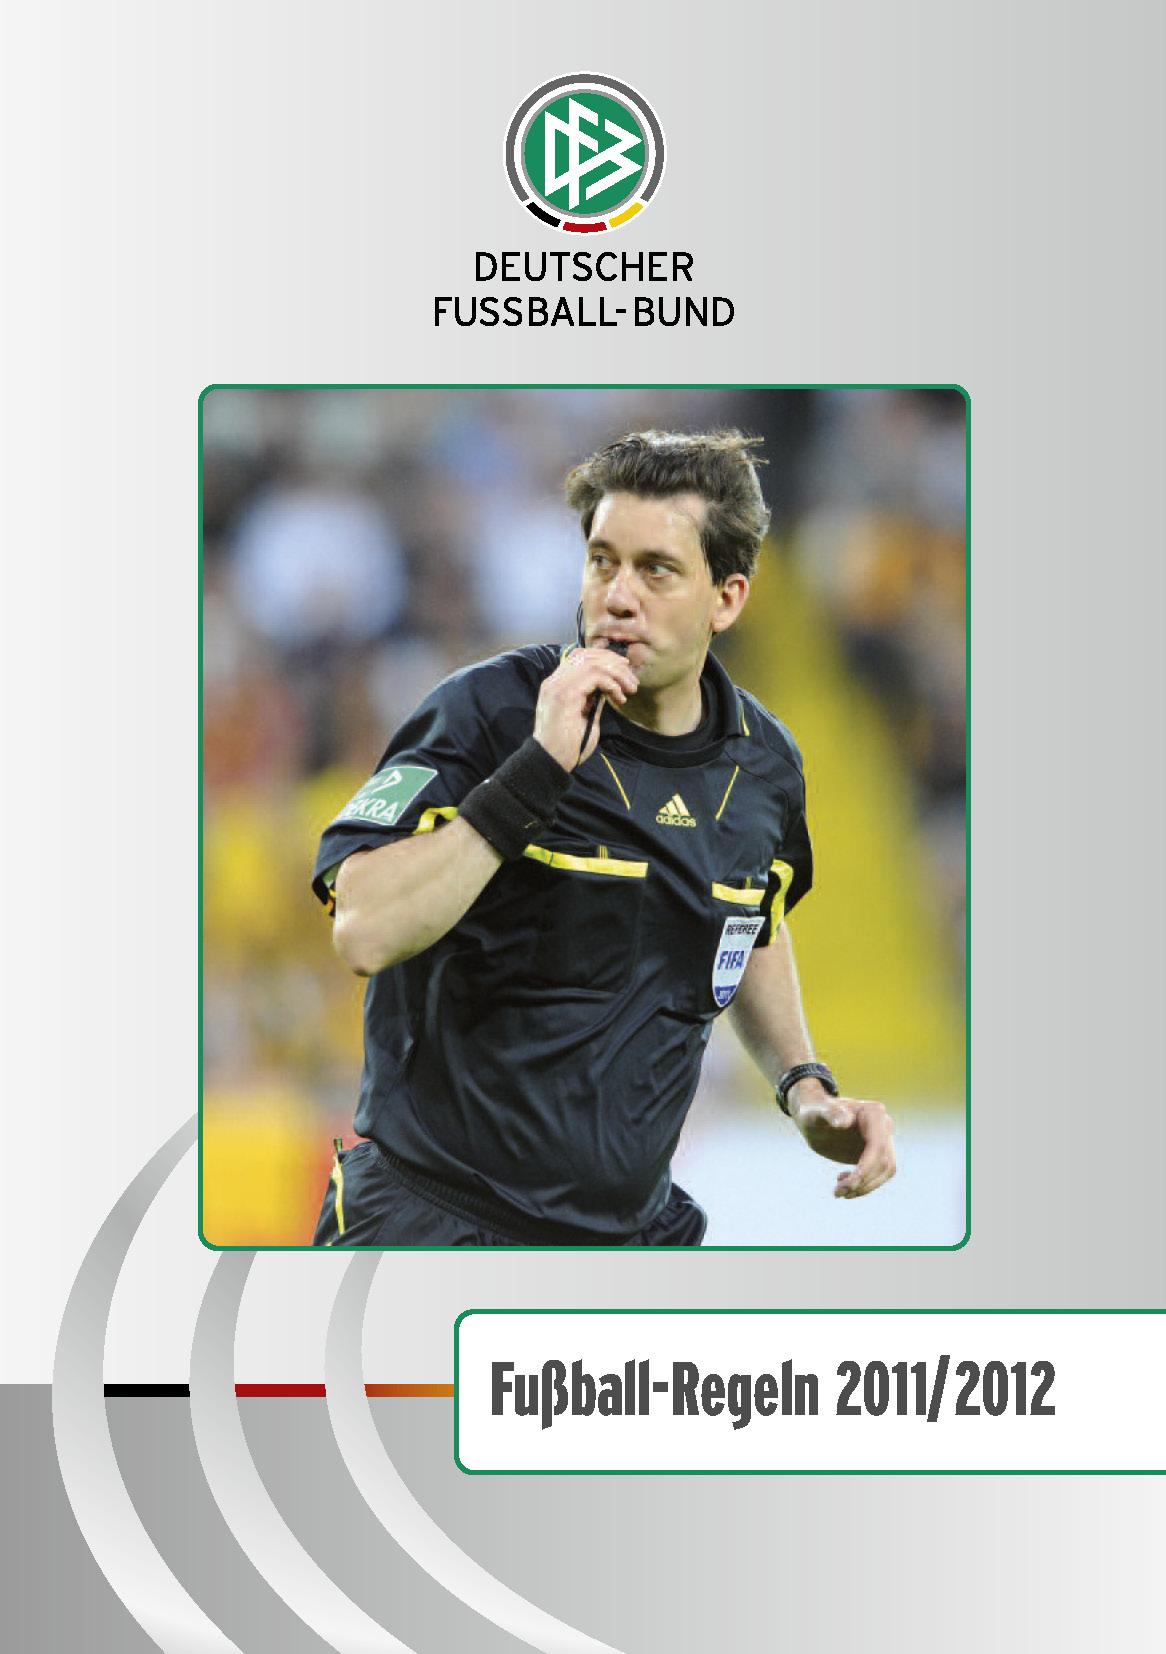 Fussball Regeln 2011/2012